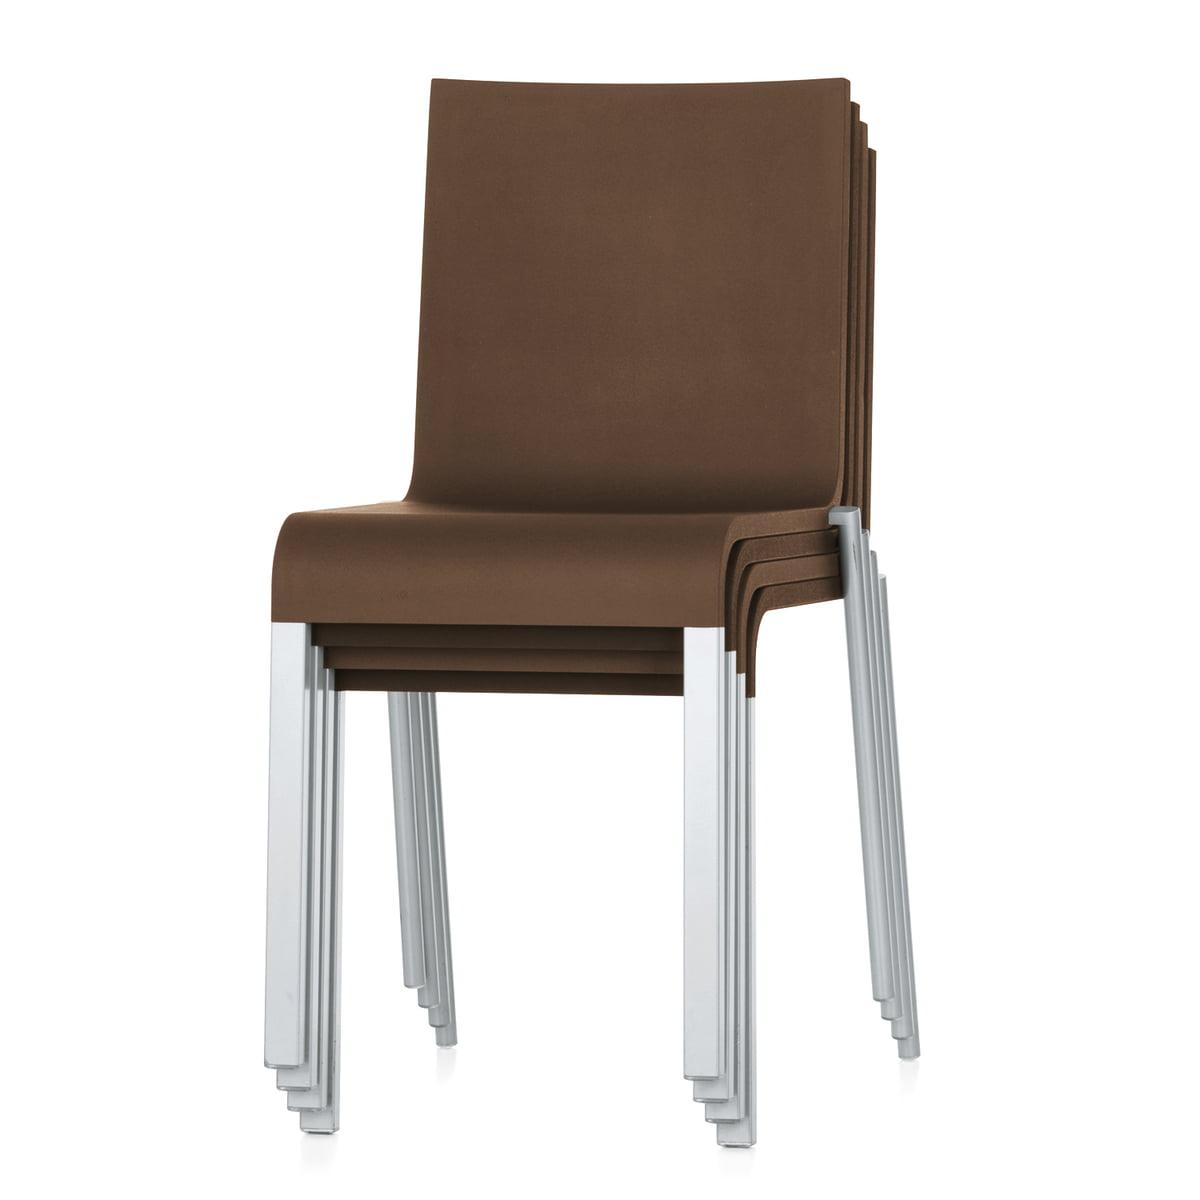 Vitra stuhl 03 bei entdecken - Designer stuhl vitra ...